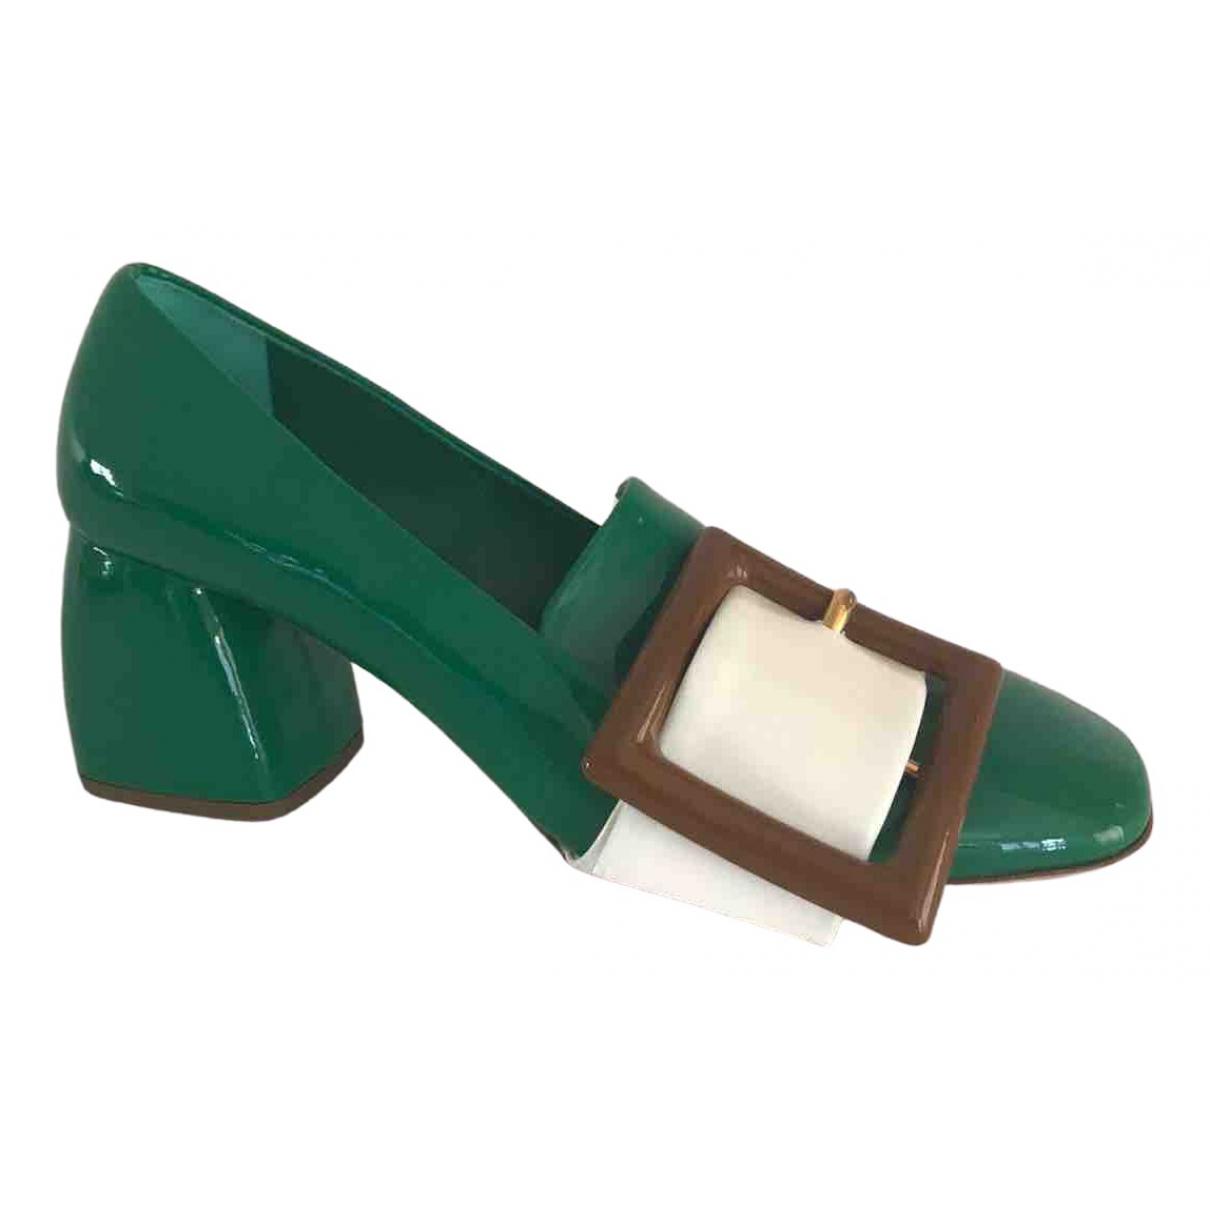 Miu Miu \N Green Patent leather Heels for Women 36 IT